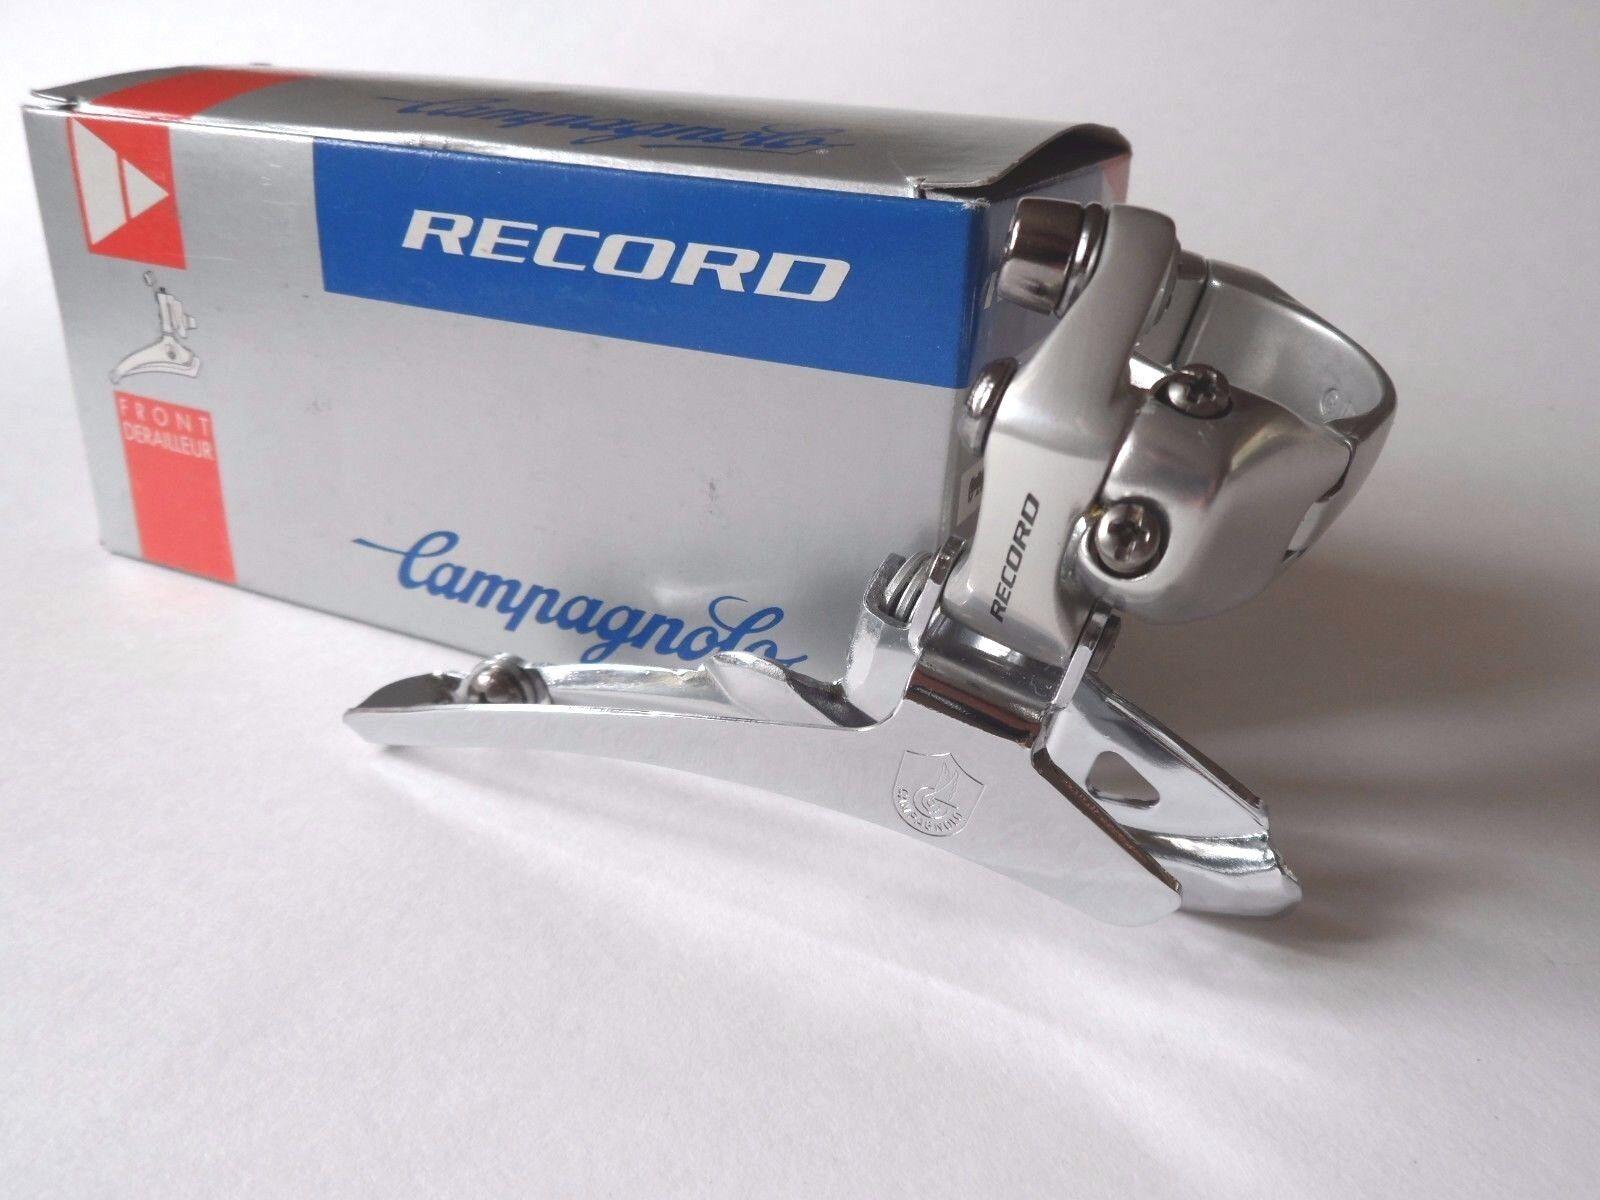 NOS Vintage 1990s Campagnolo Record (Titanium) double front clamp-on derailleur